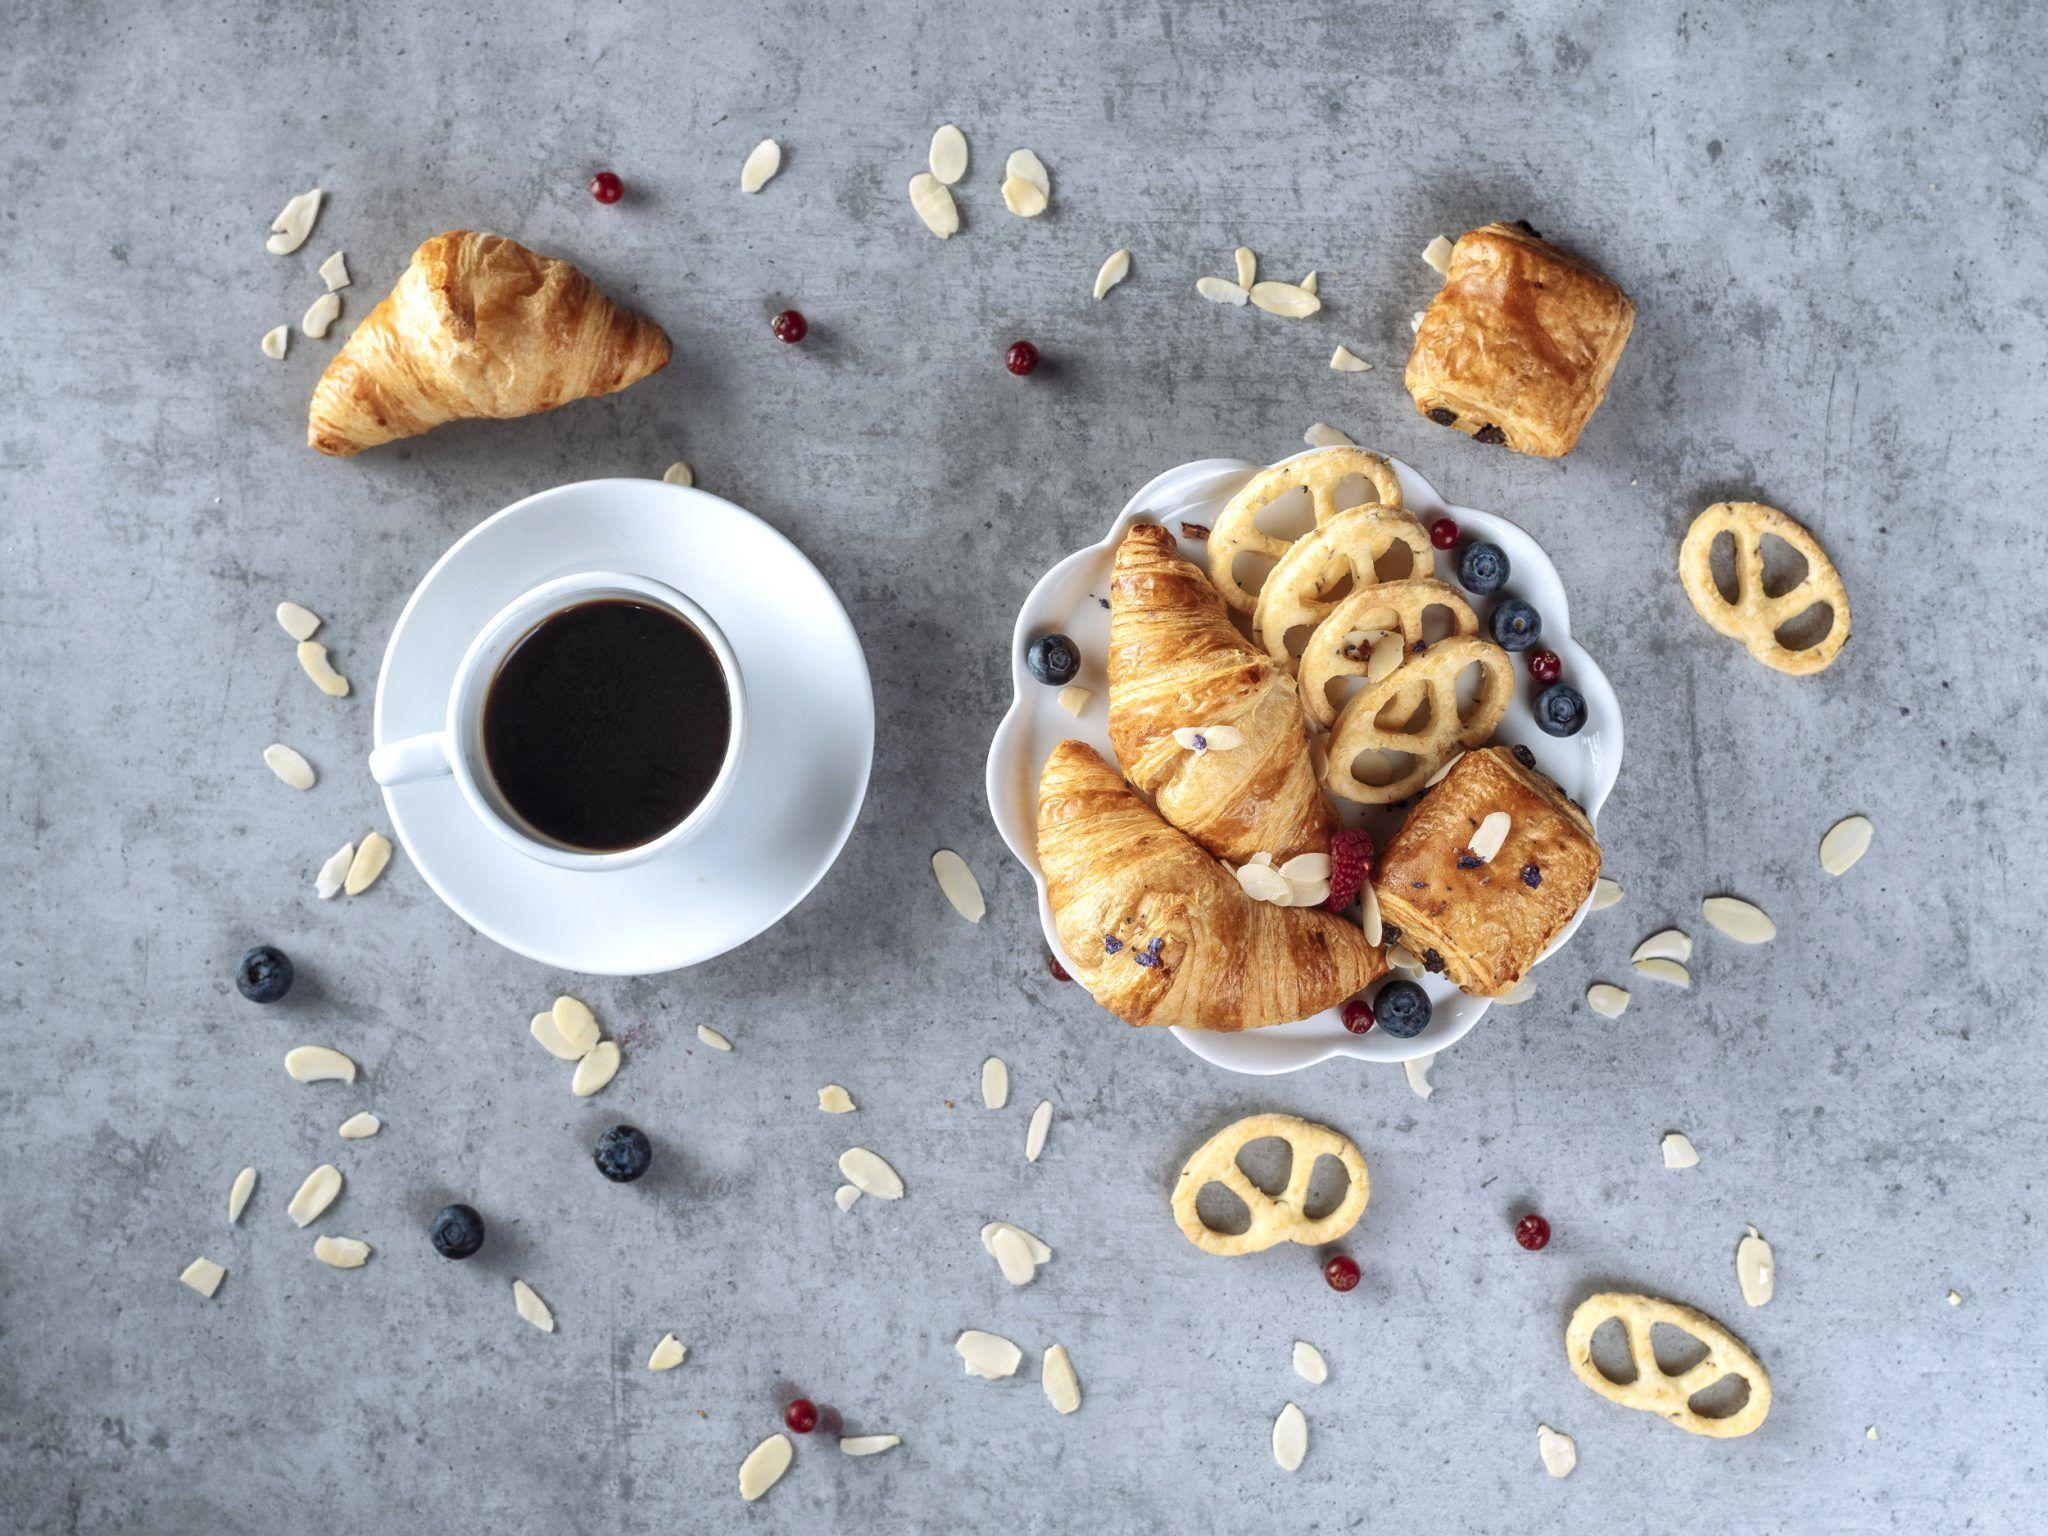 Catering Eveniment Meniu Coffee Break scaled - Bucate pe Roate